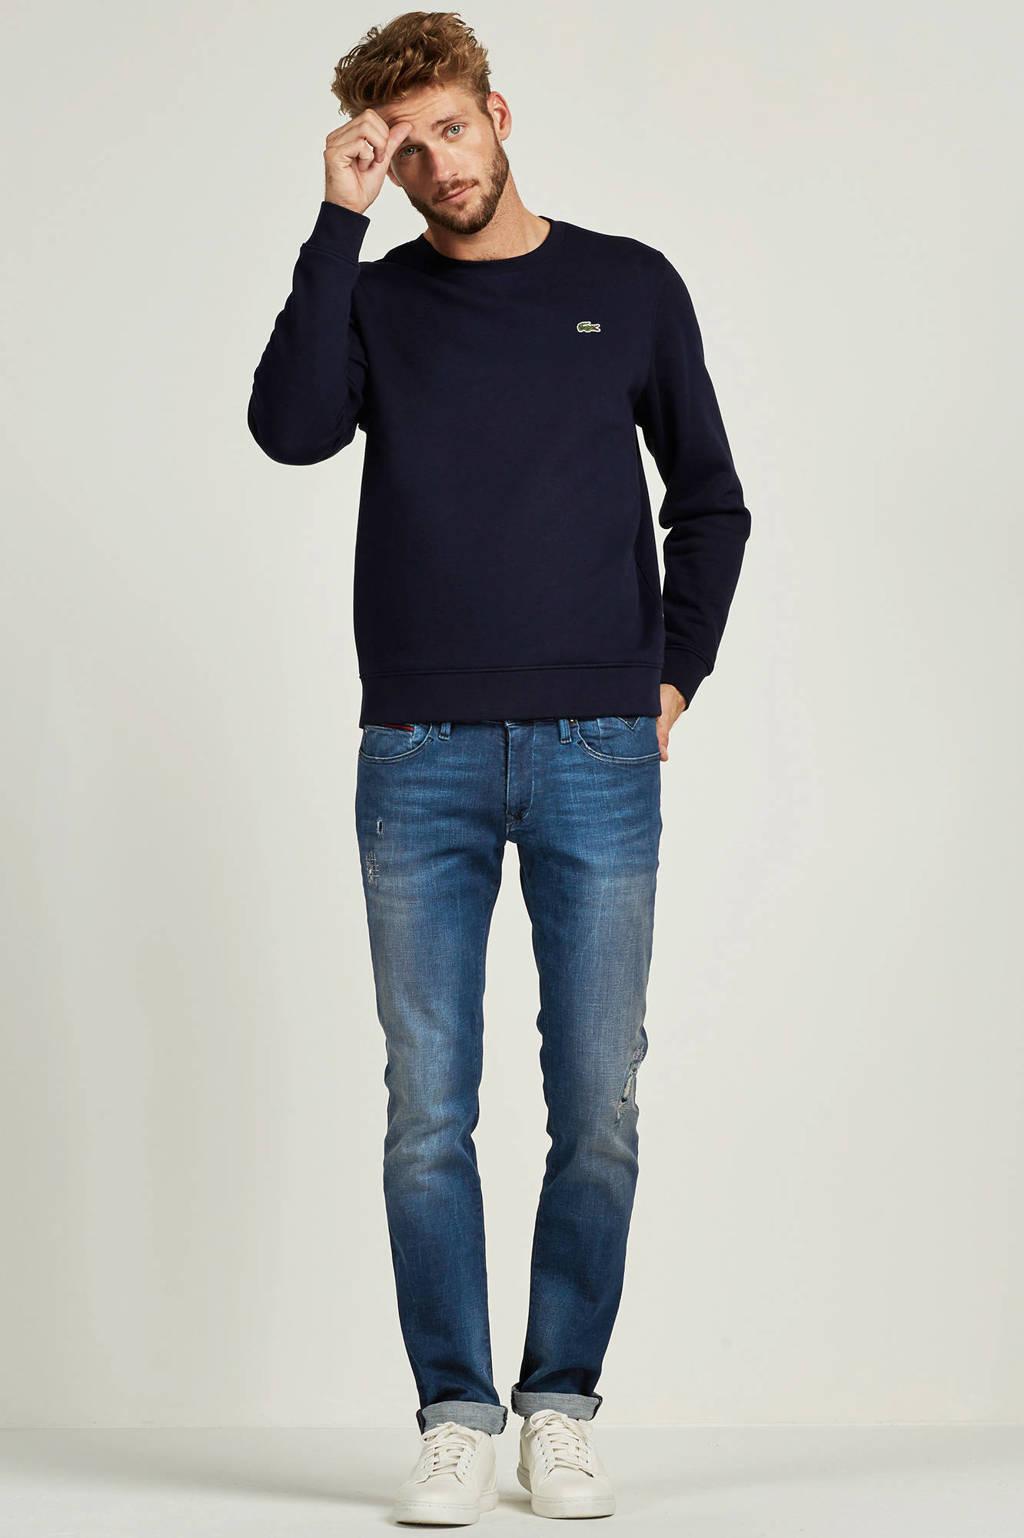 Lacoste   sweater, Marine